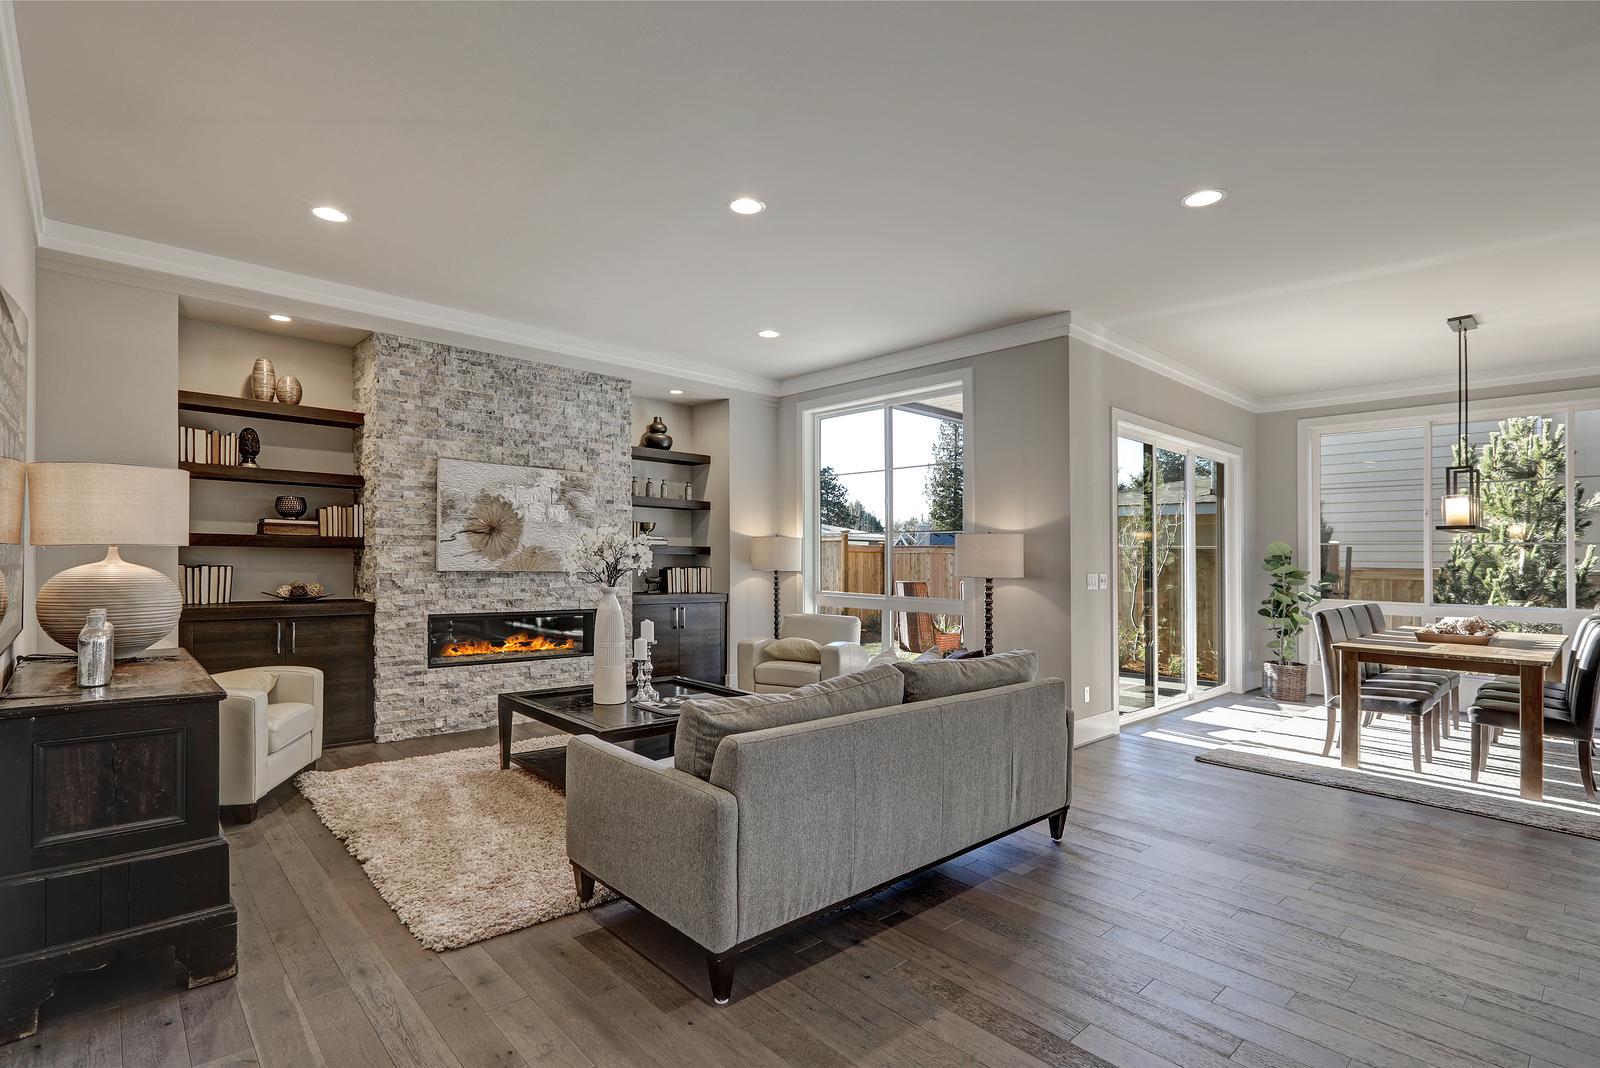 bigstock-Chic-Living-Room-Interior-In-G-166085468.jpg